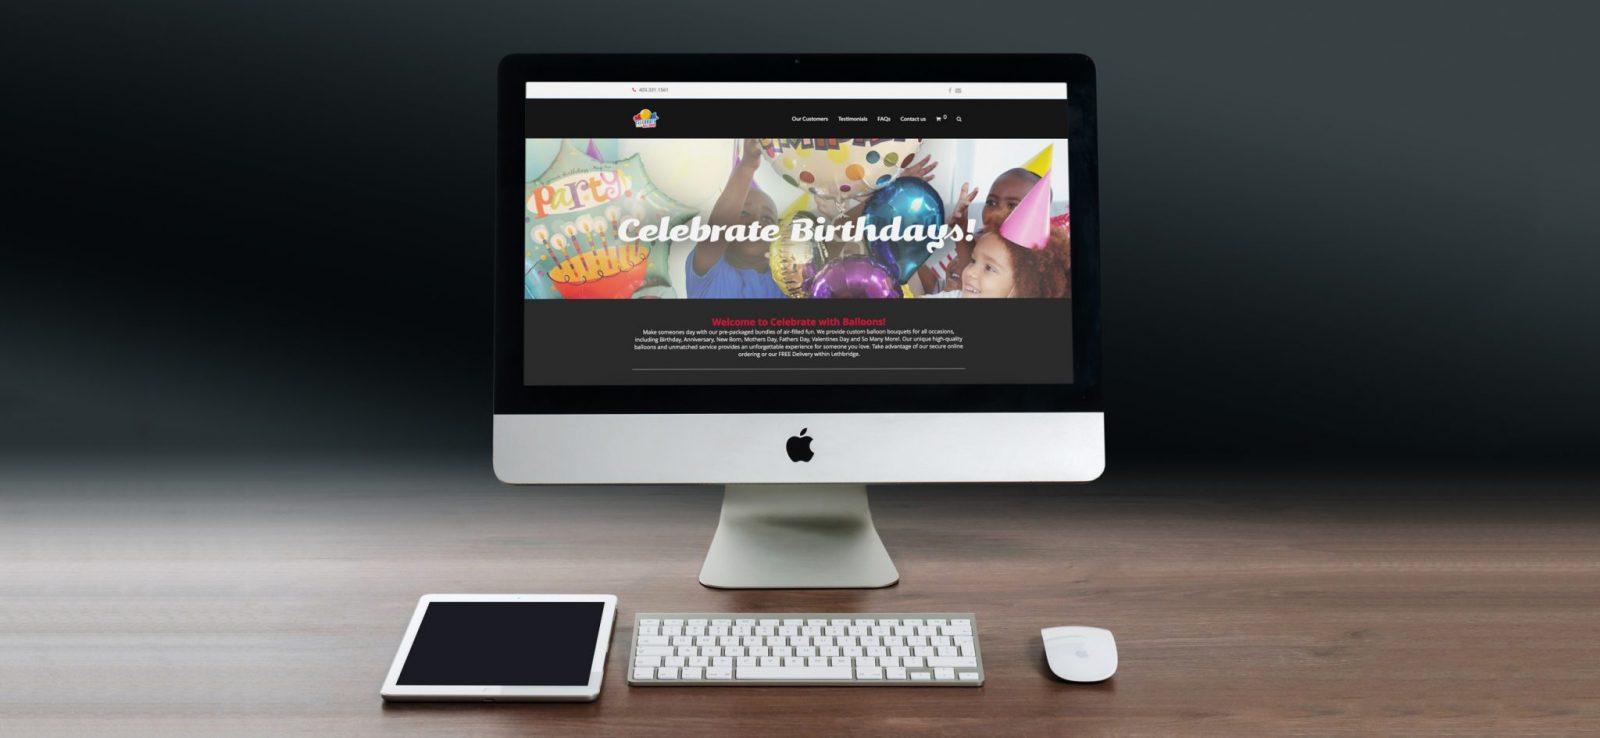 Celebrate With Balloons - Web Banner Design - Lethbridge Alberta